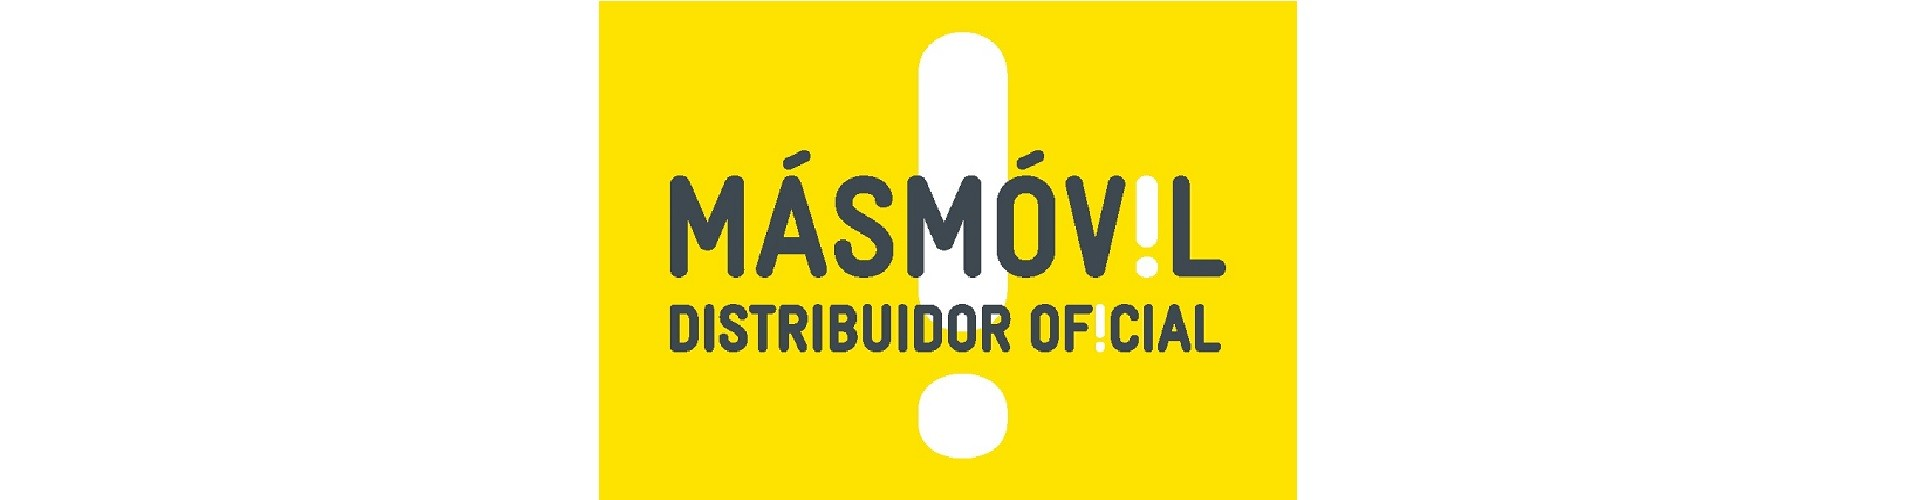 distribuidor masmovil